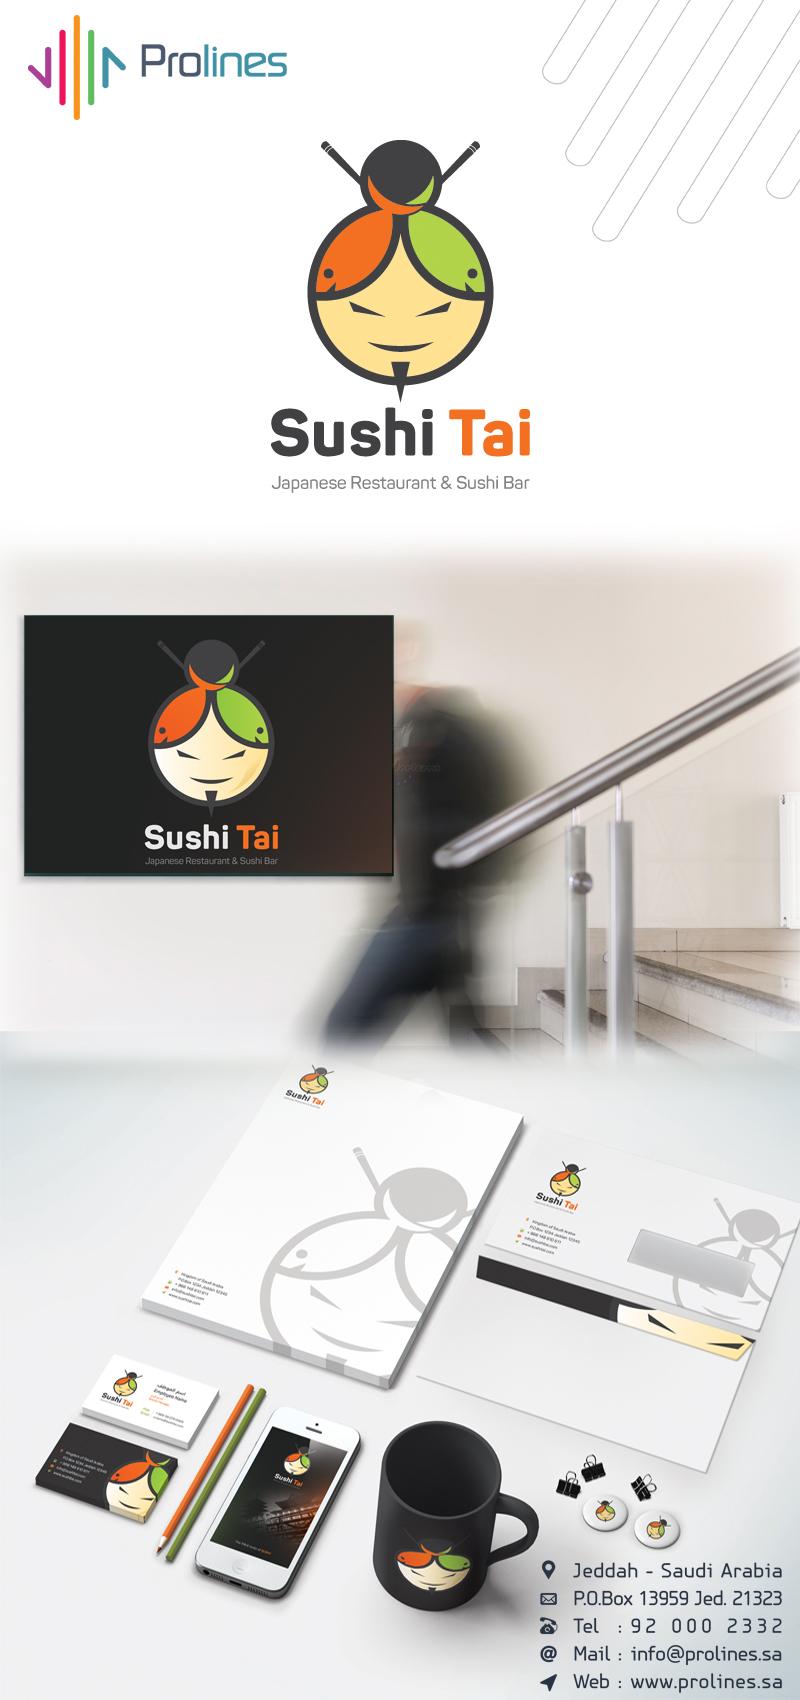 sushi-tai-brand-saudi-arabia